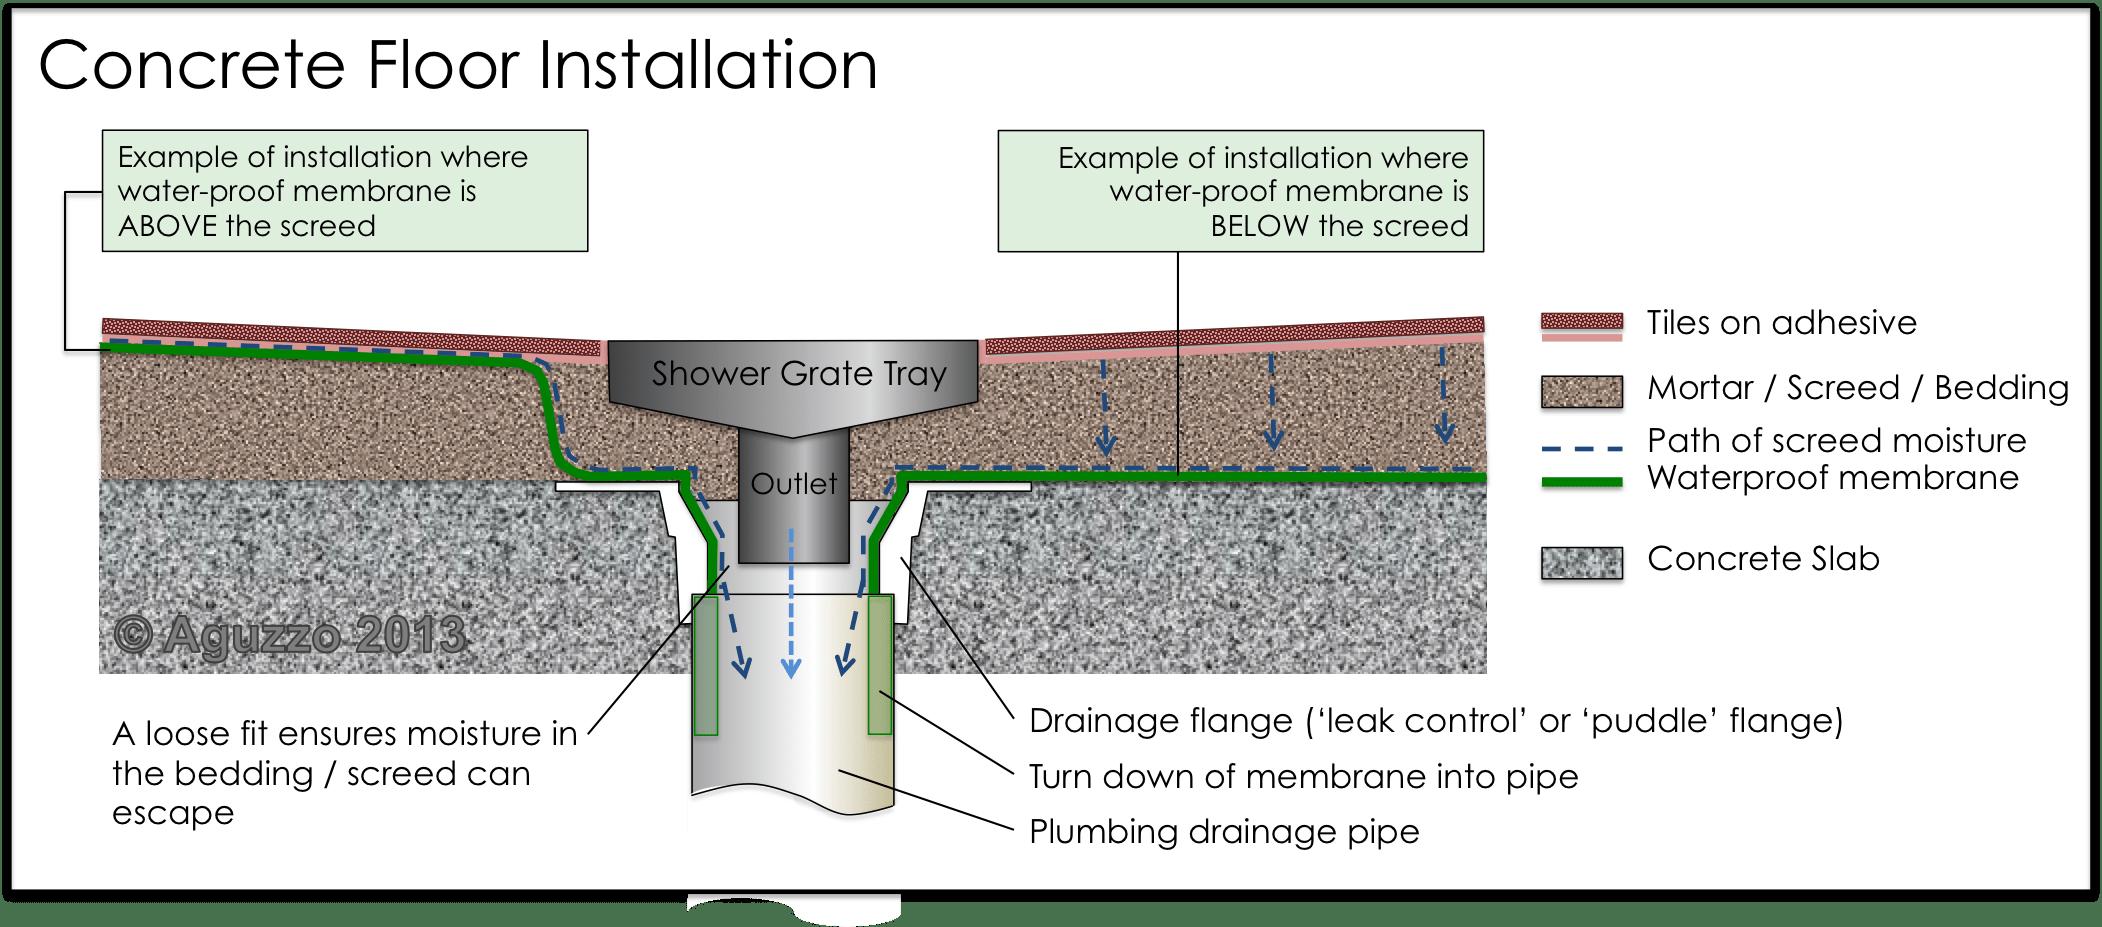 bathroom plumbing diagram concrete slab 2000 international 4900 dt466e wiring tile insert shower grate channel stainless steel standard